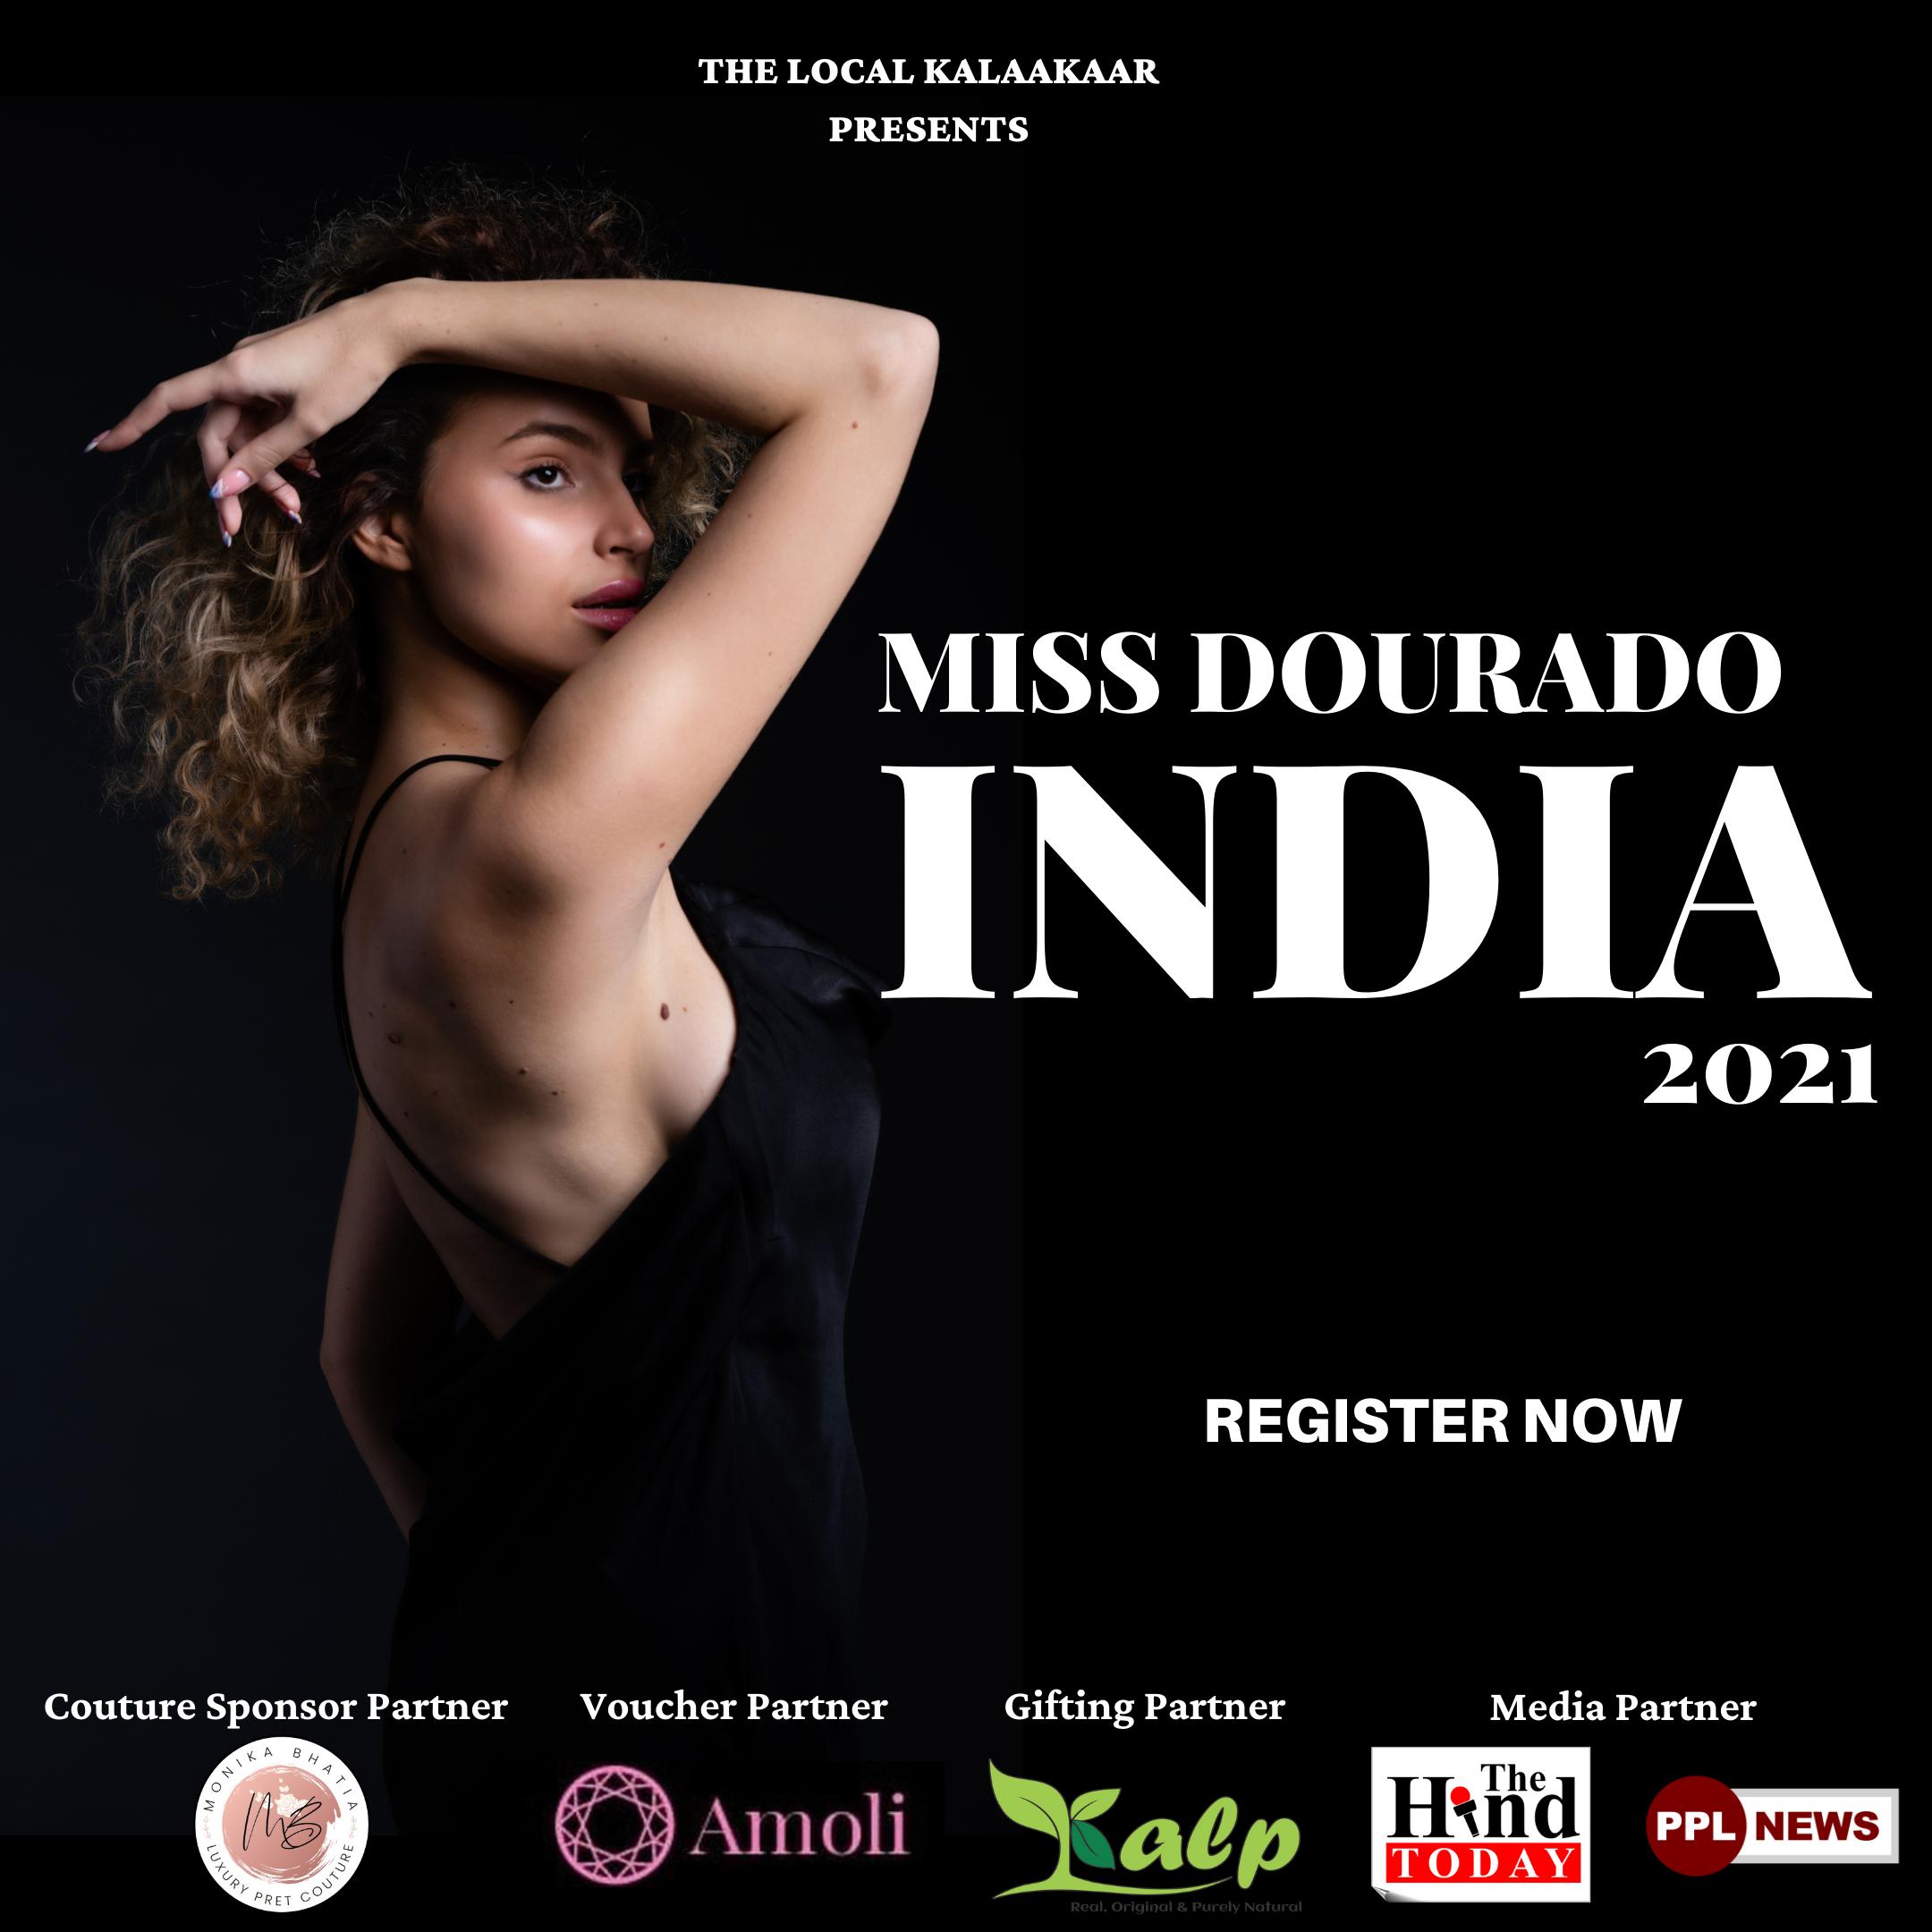 Miss Dourado India 2021